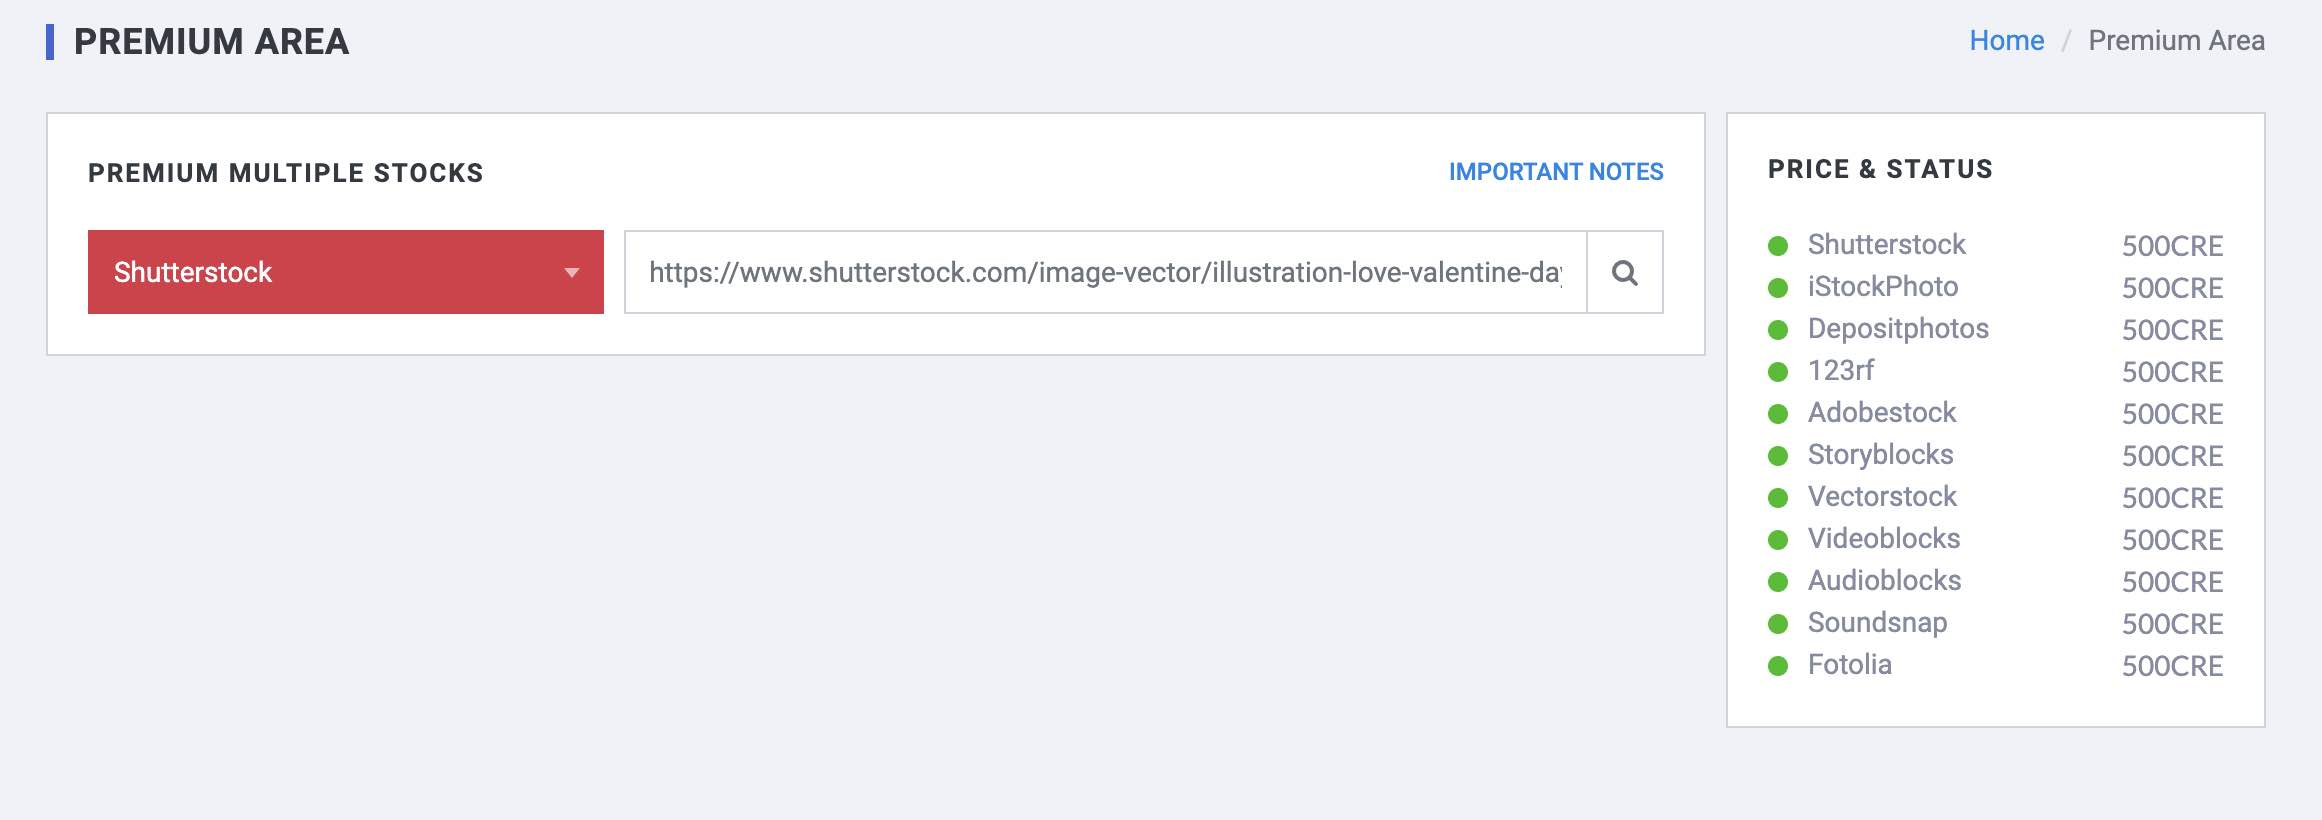 download shutterstock